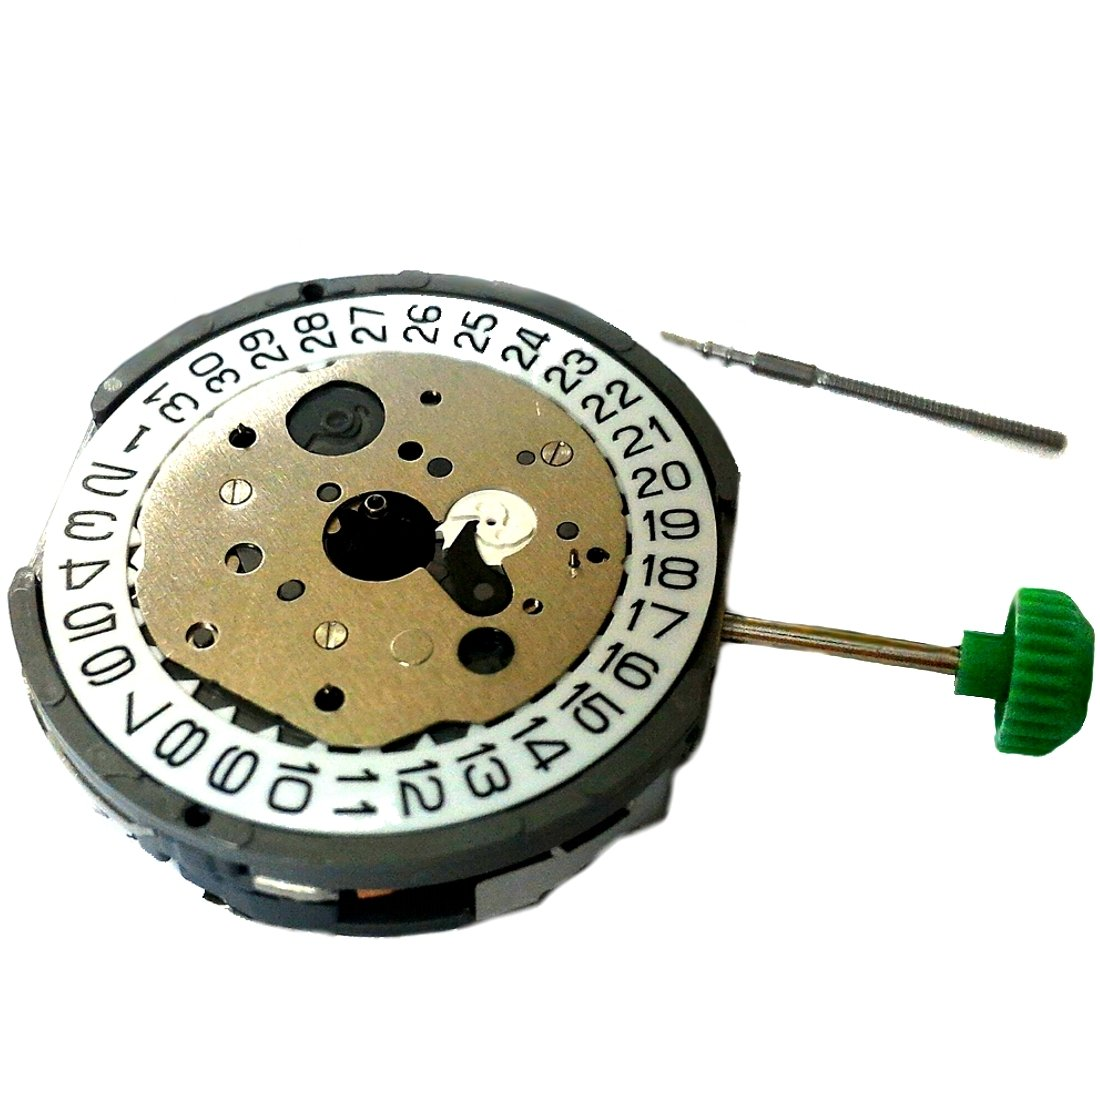 MIYOTA FS60 OOA 3 EYES. Chronograph Slanted Quartz Watch Movement